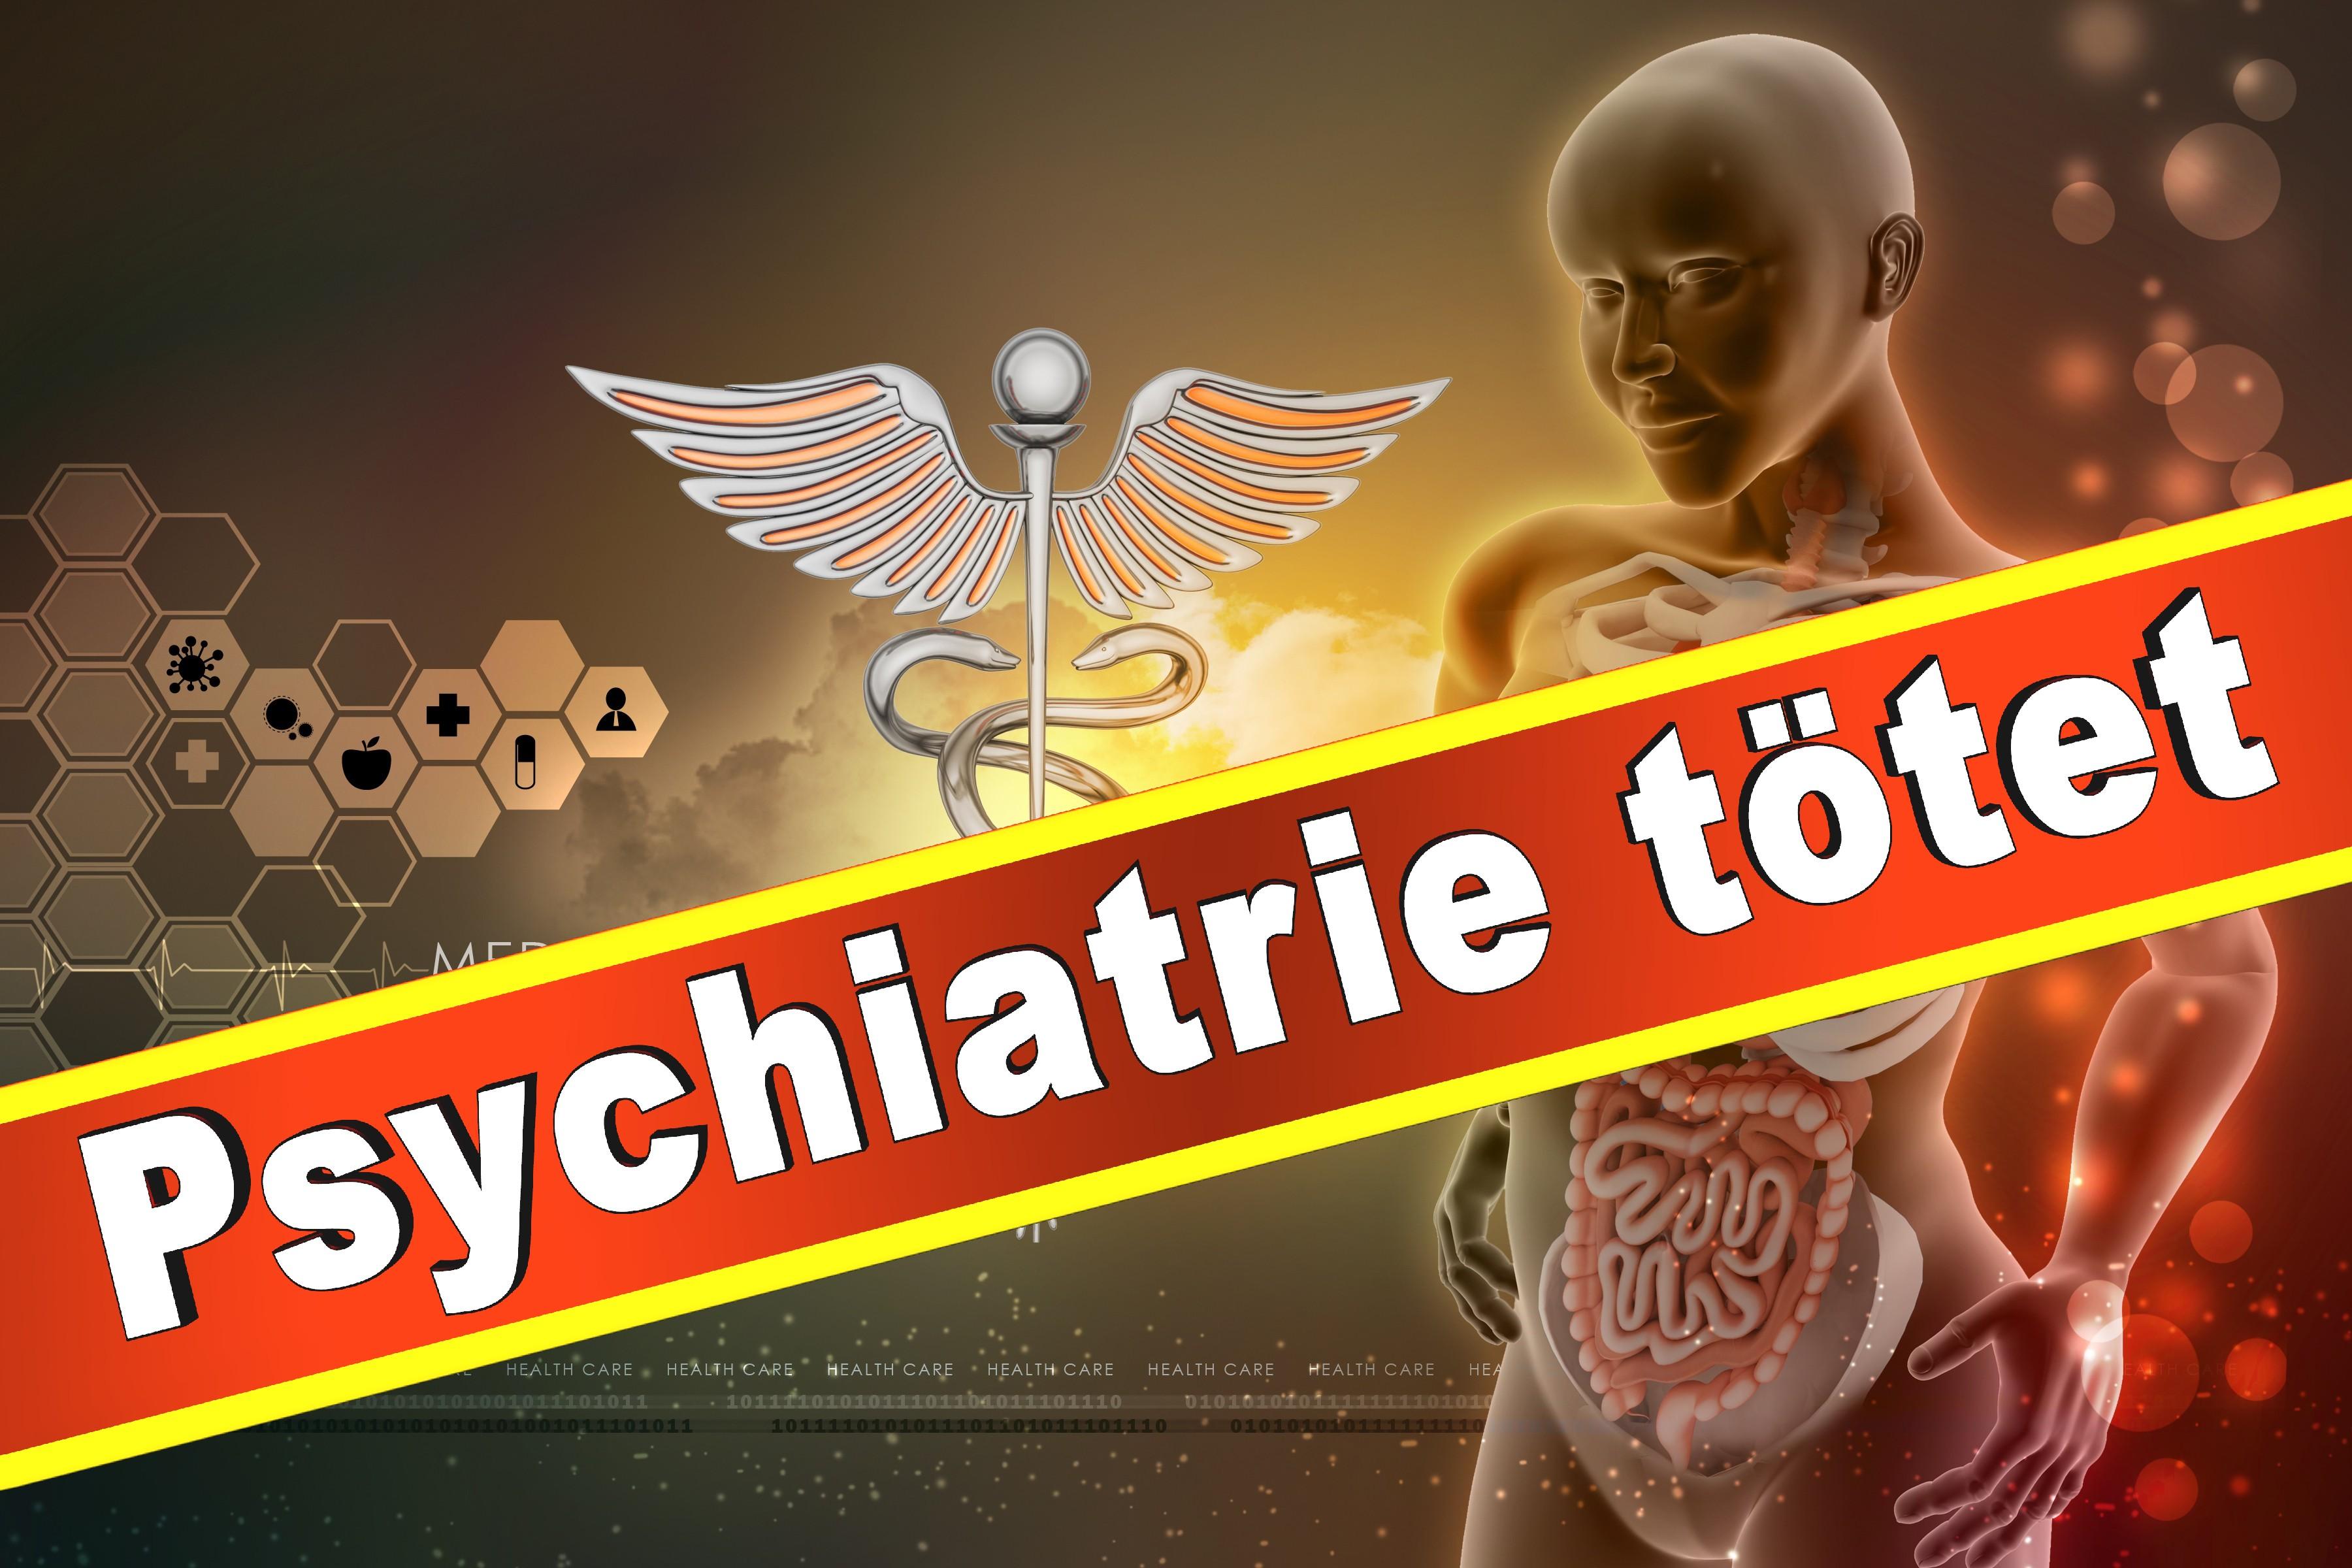 Dr C M Hubert Neurologe Und Psychiater Psychiater Hannover Psychotherapie